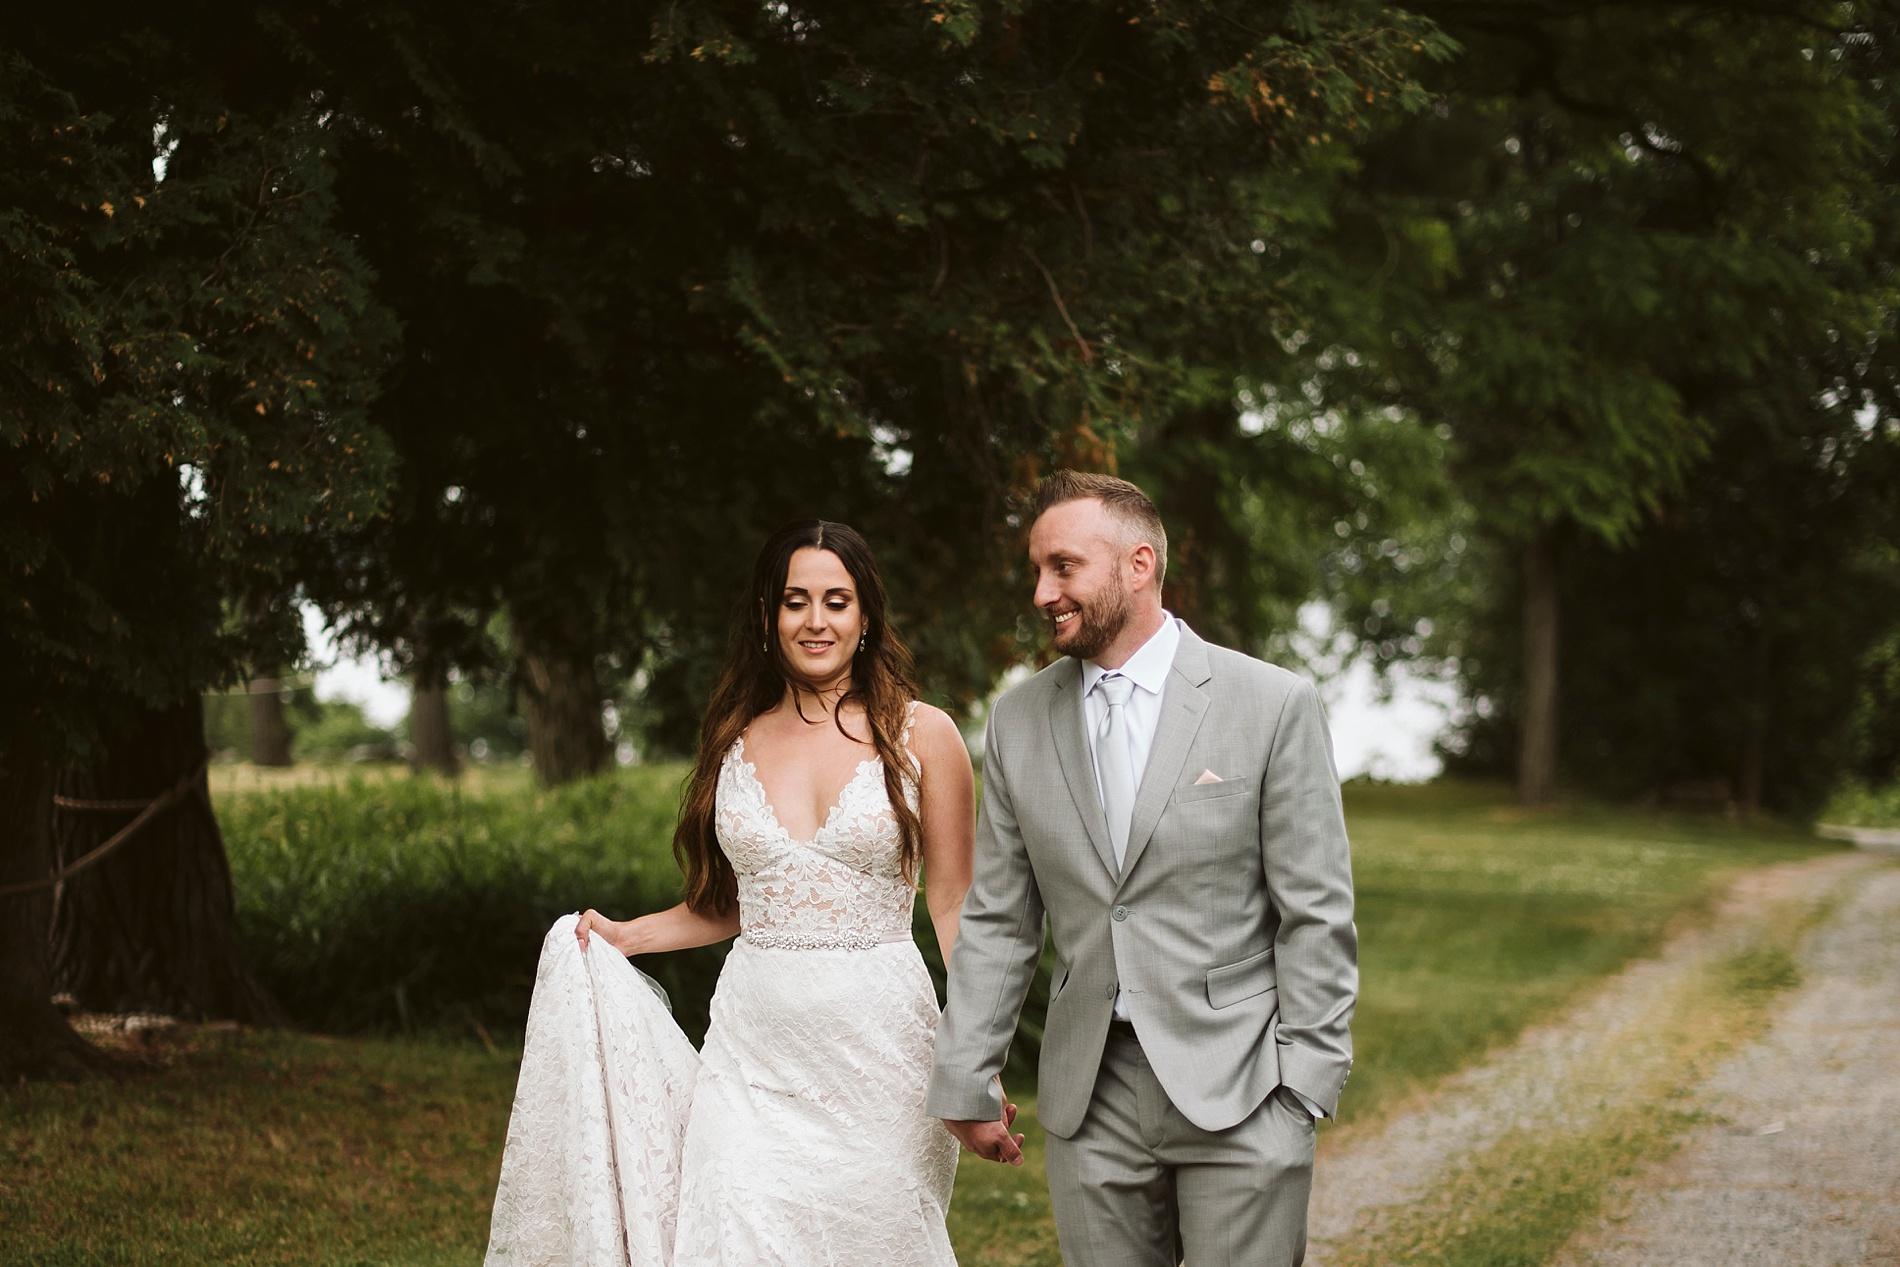 Kawartha_Lakes_Wedding_Bobcageon_Eganridge_Resort_Toronto_Photographer_0058.jpg